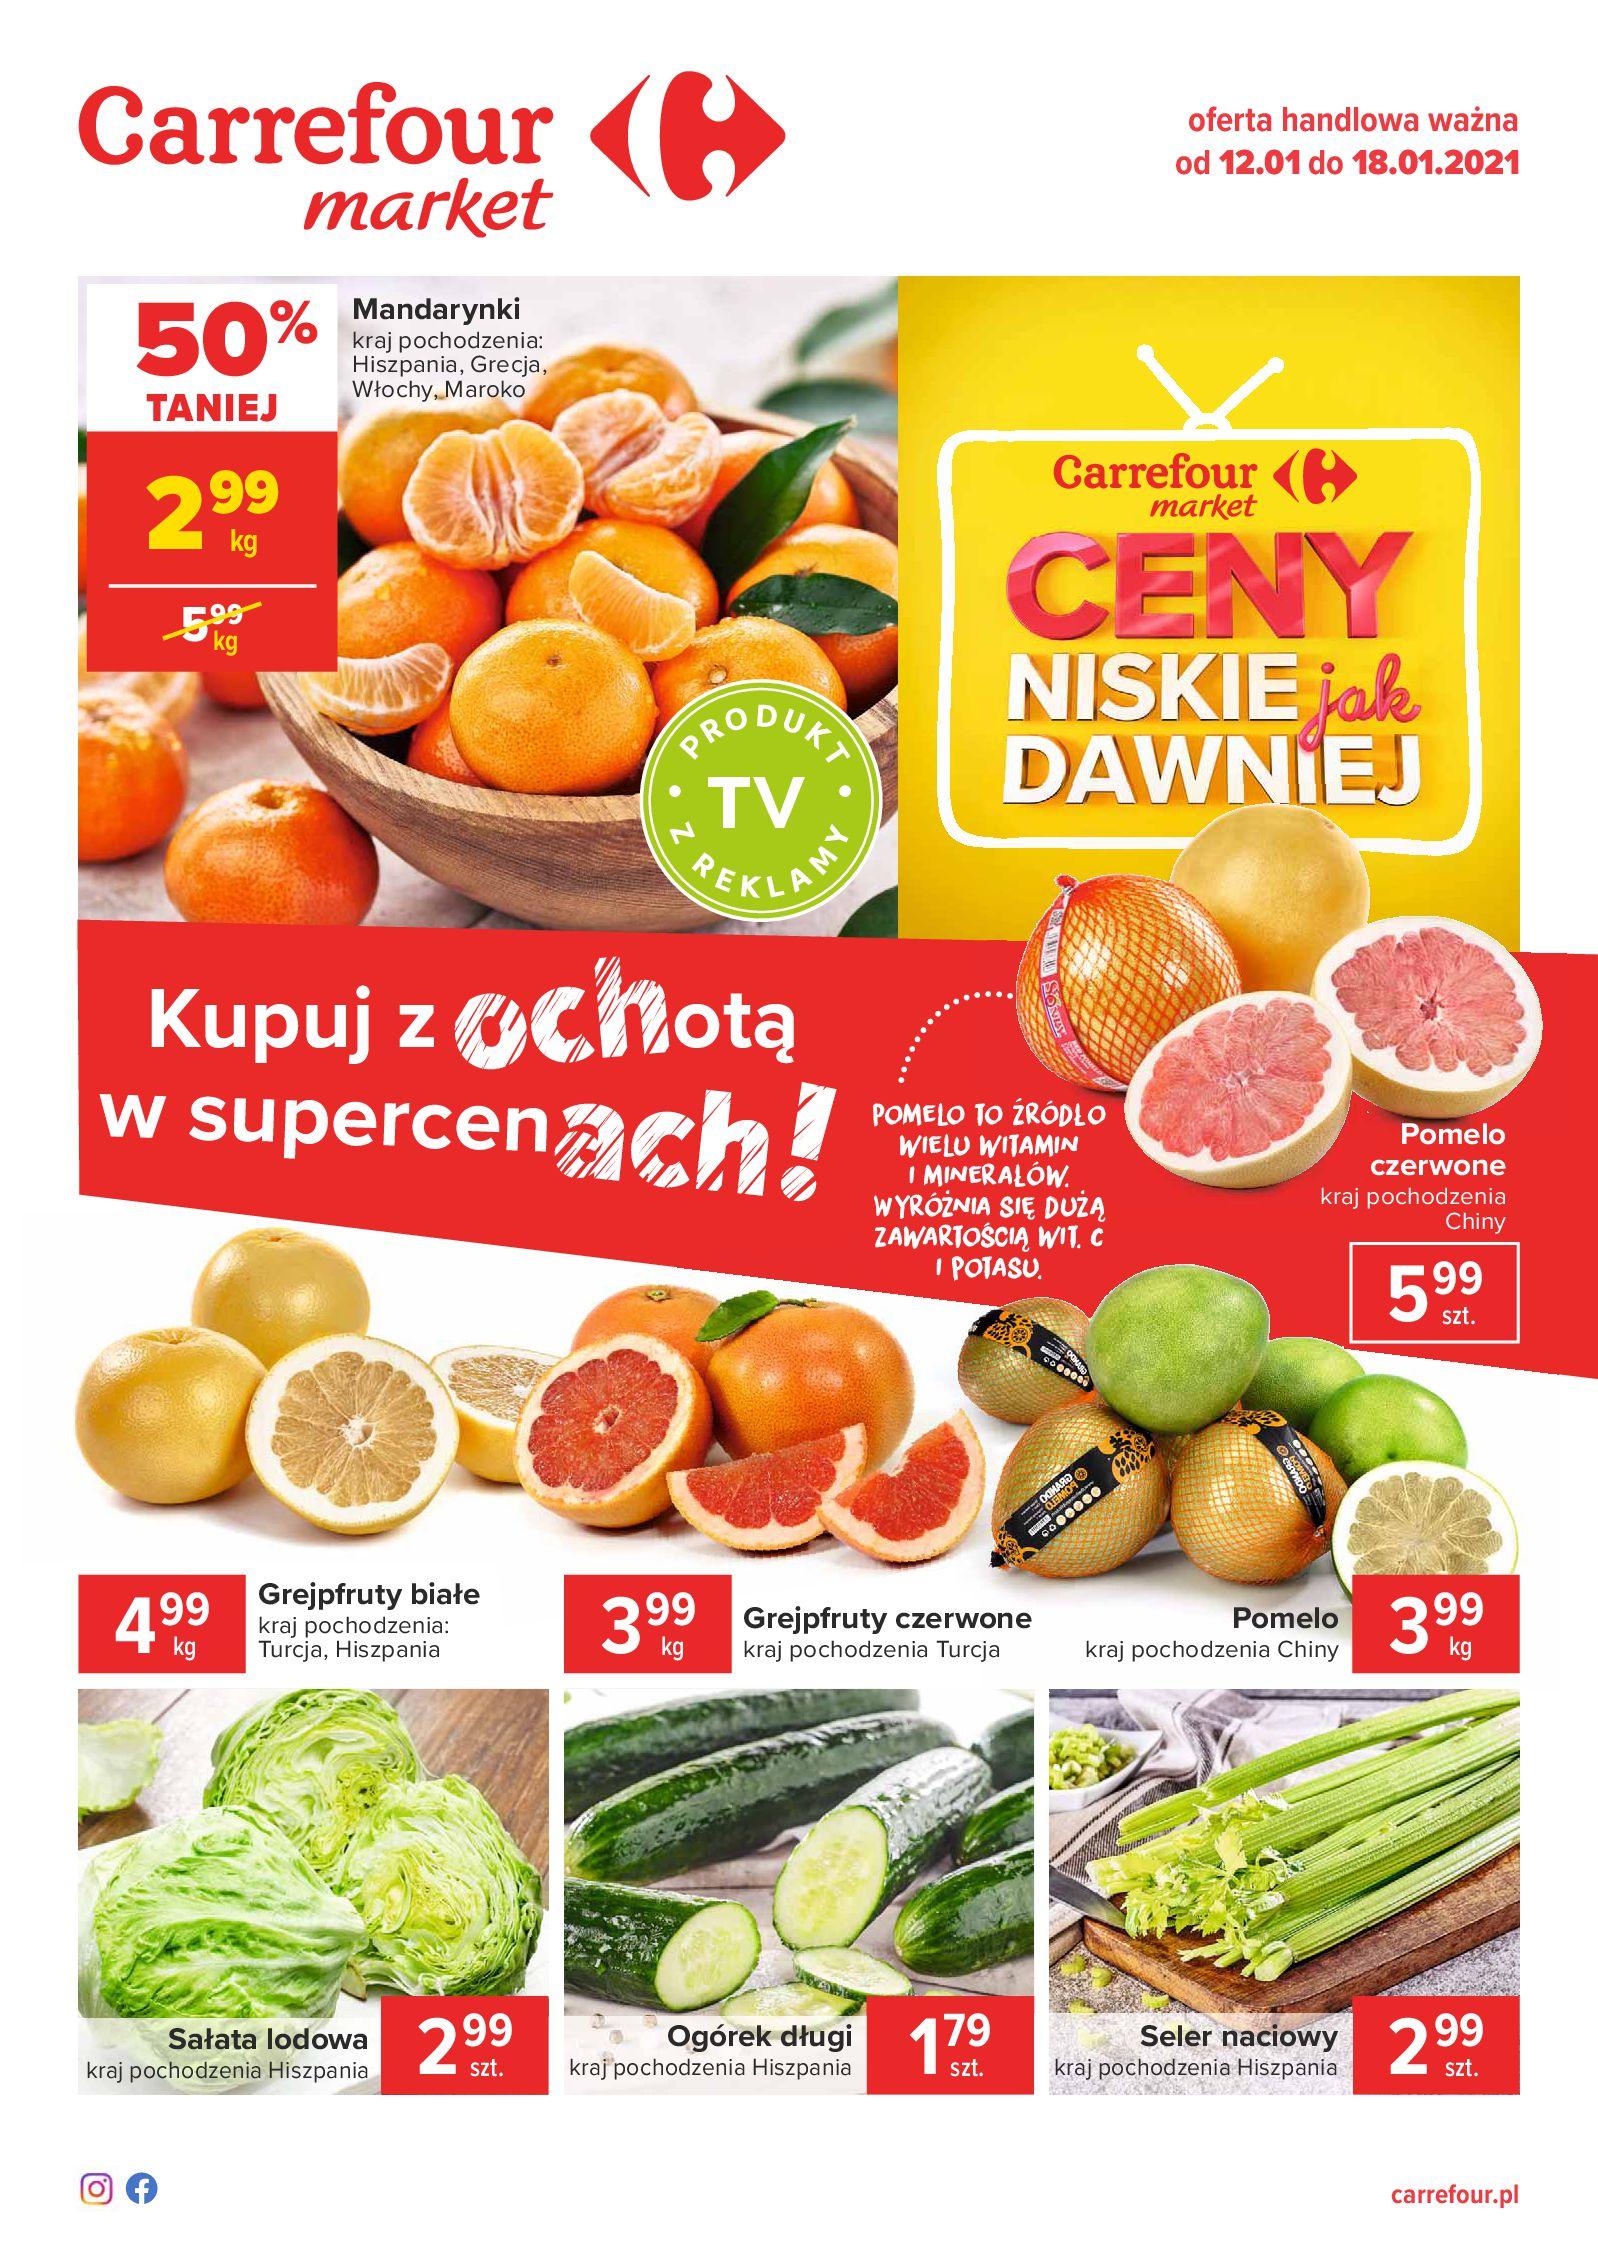 Carrefour Market:  Gazetka Market 11.01.2021